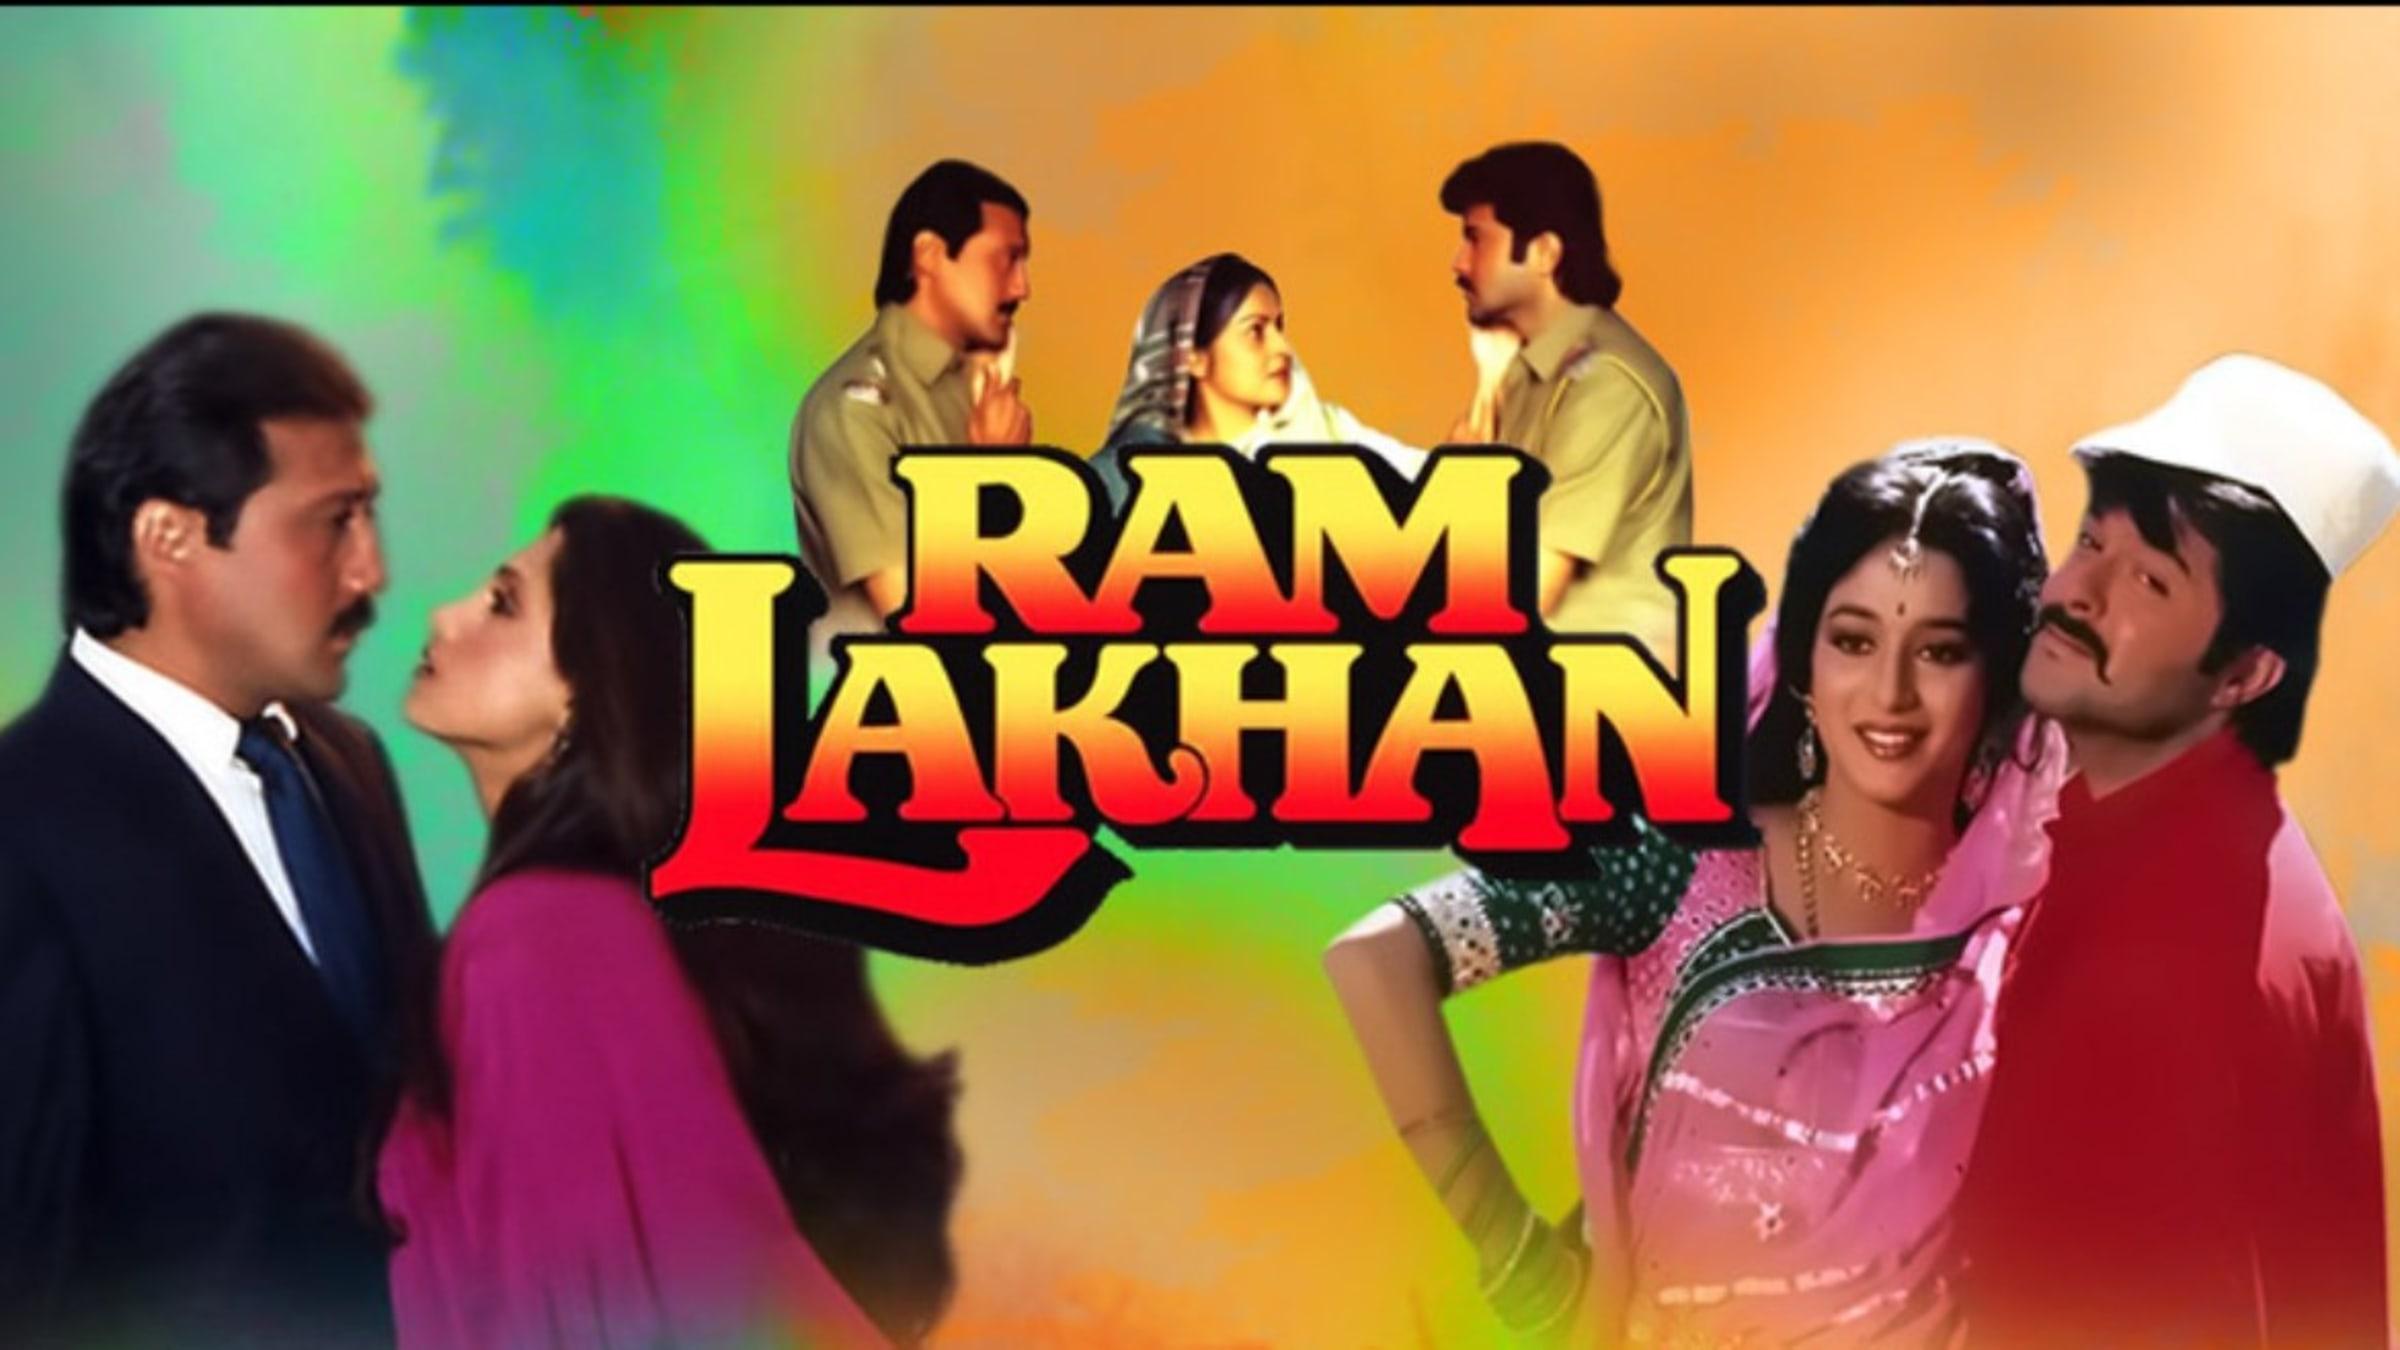 Watch Ram Lakhan Movie Online - Stream Full HD Movies on Airtel Xstream